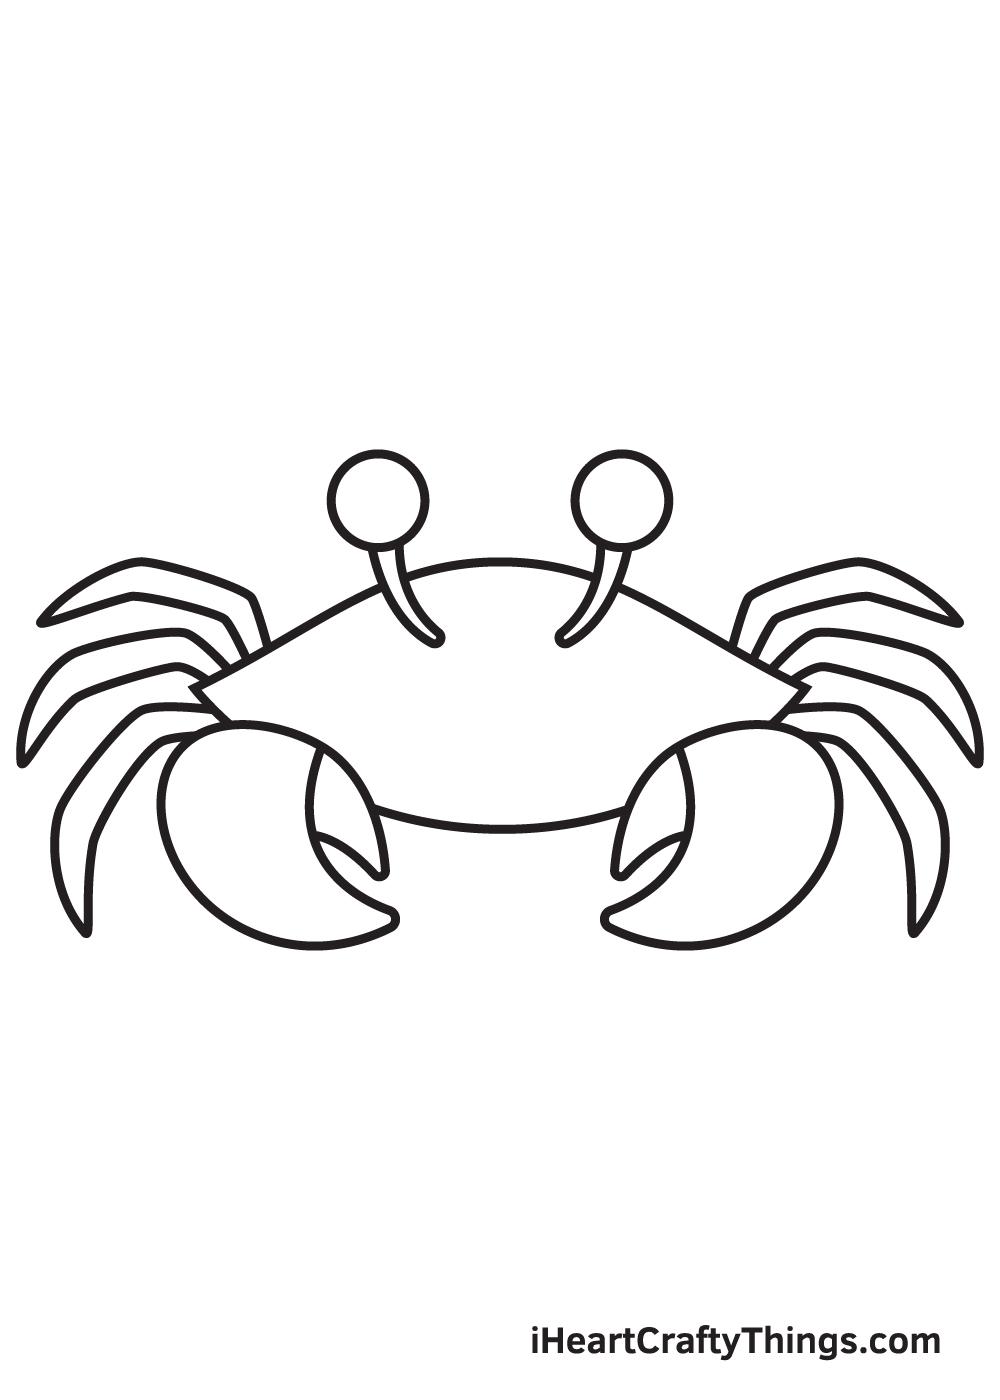 Crab Drawing – Step 7